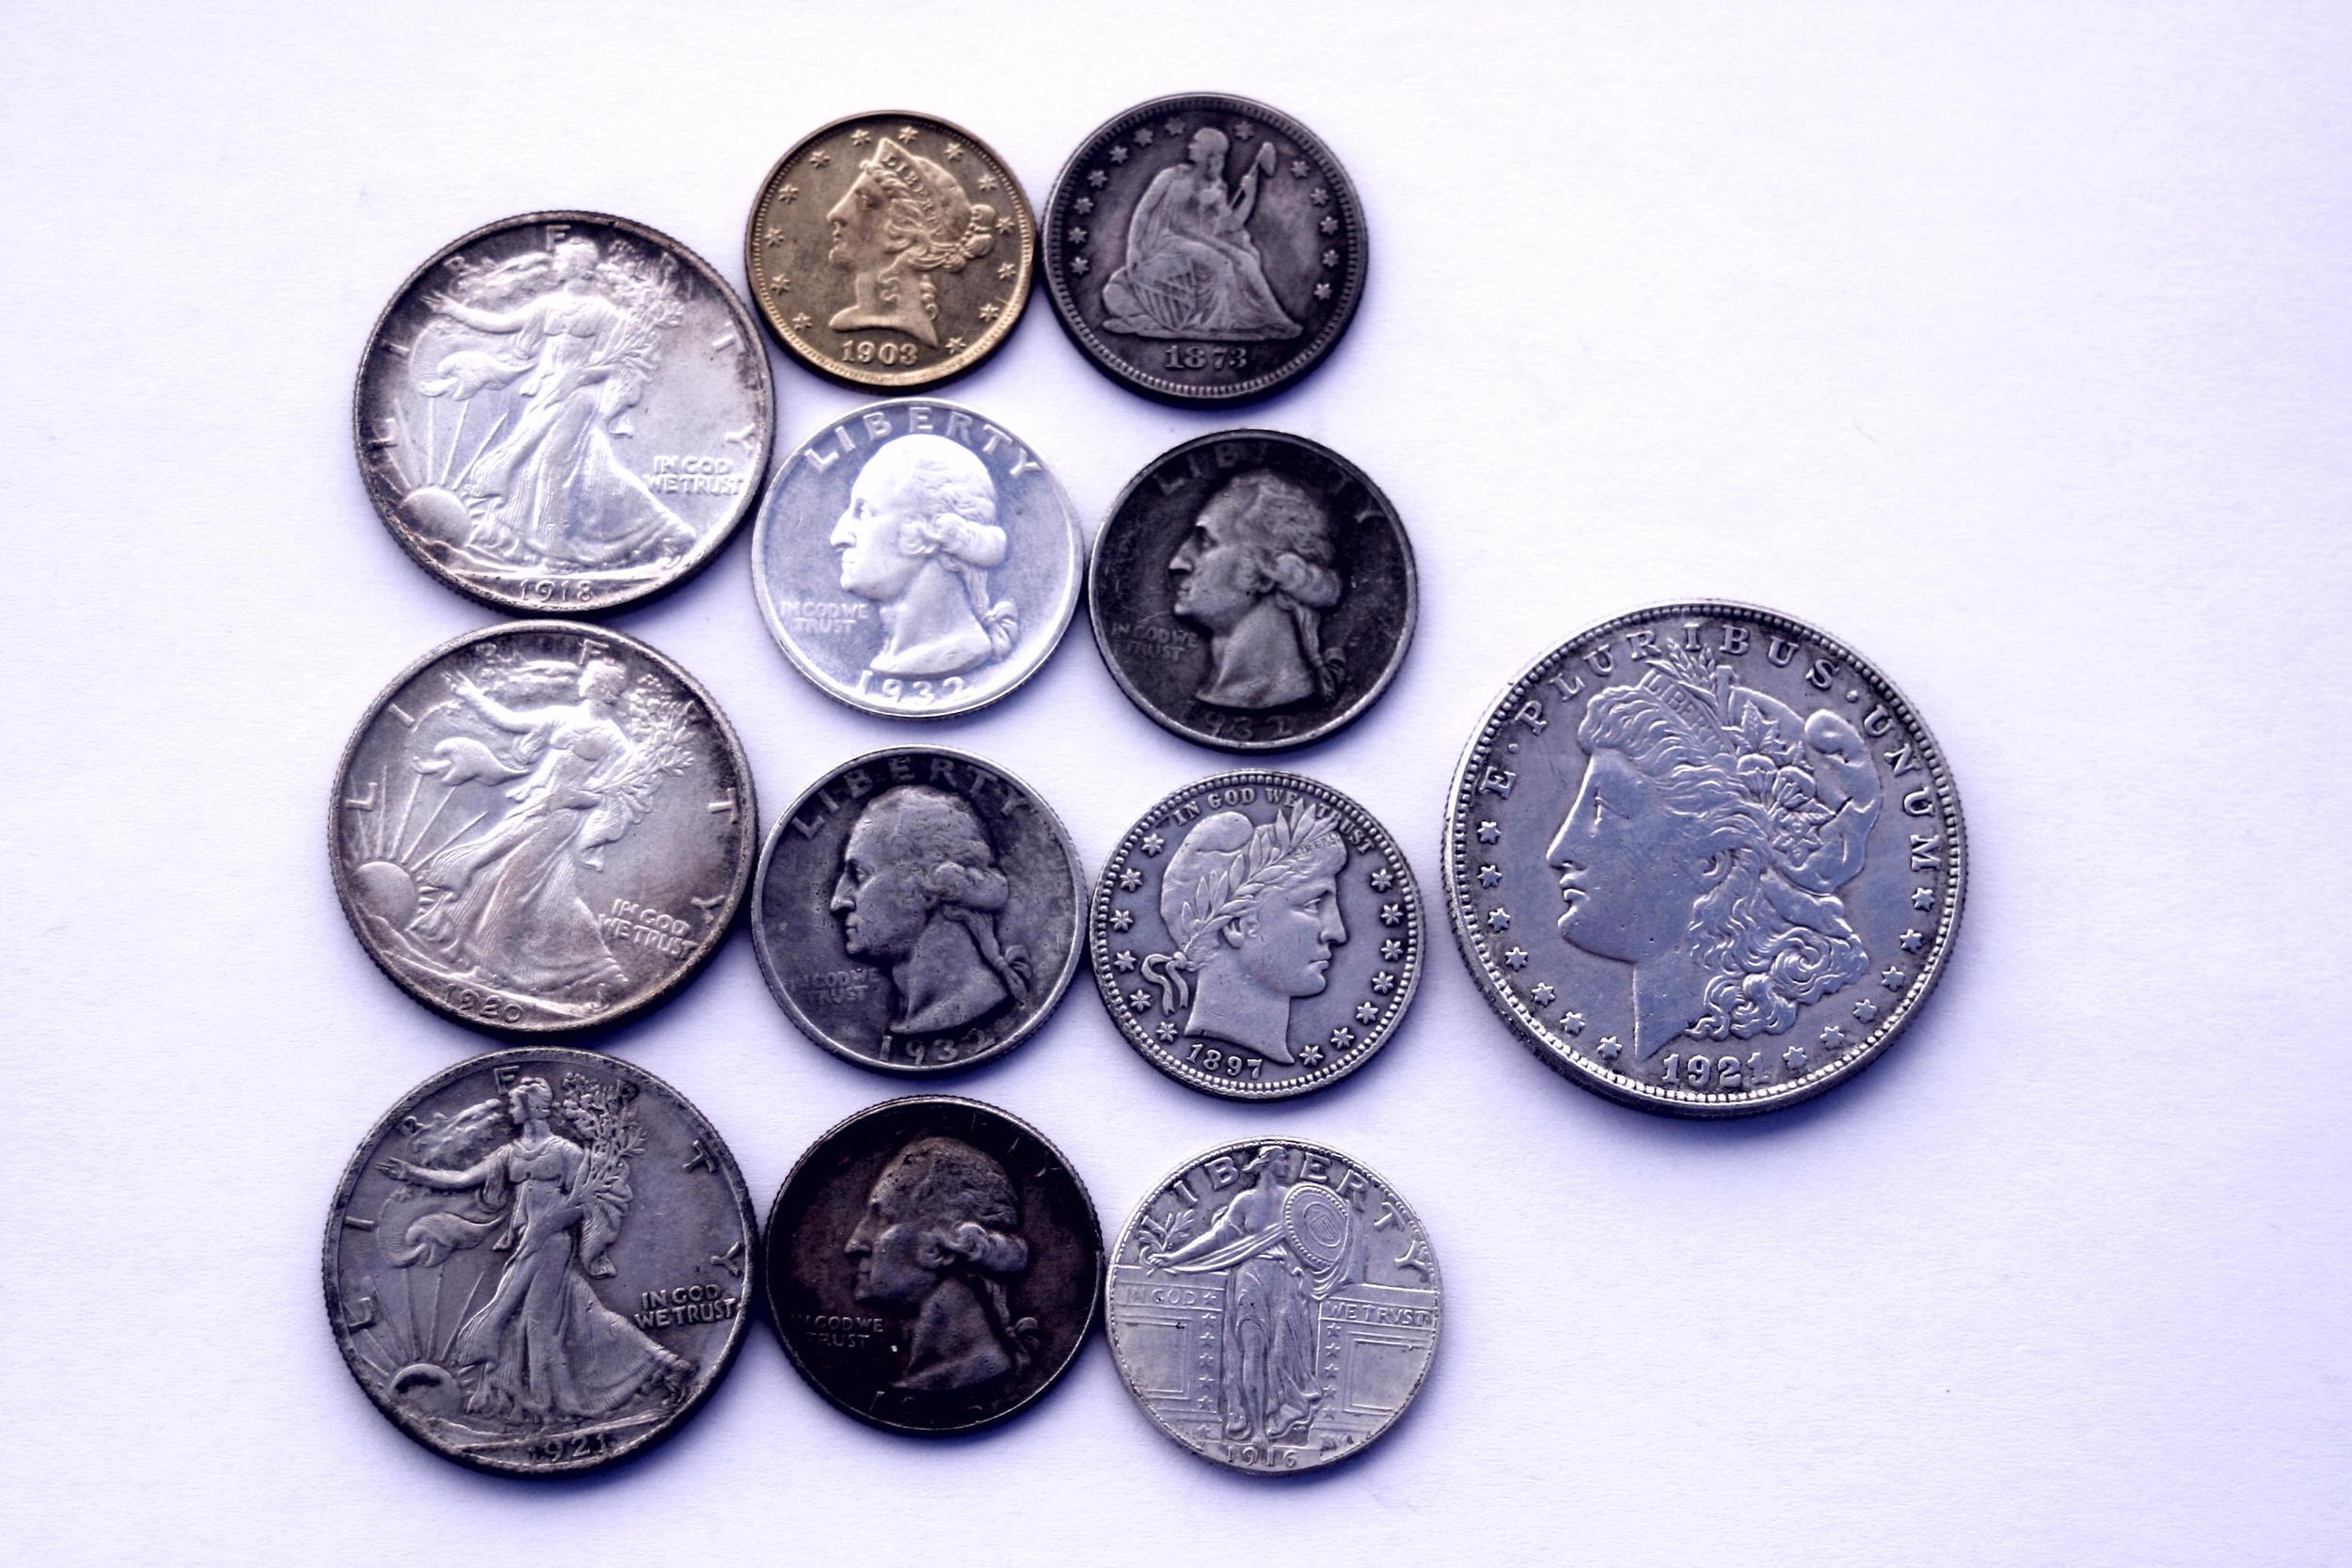 counterfeit silver coins2.jpg